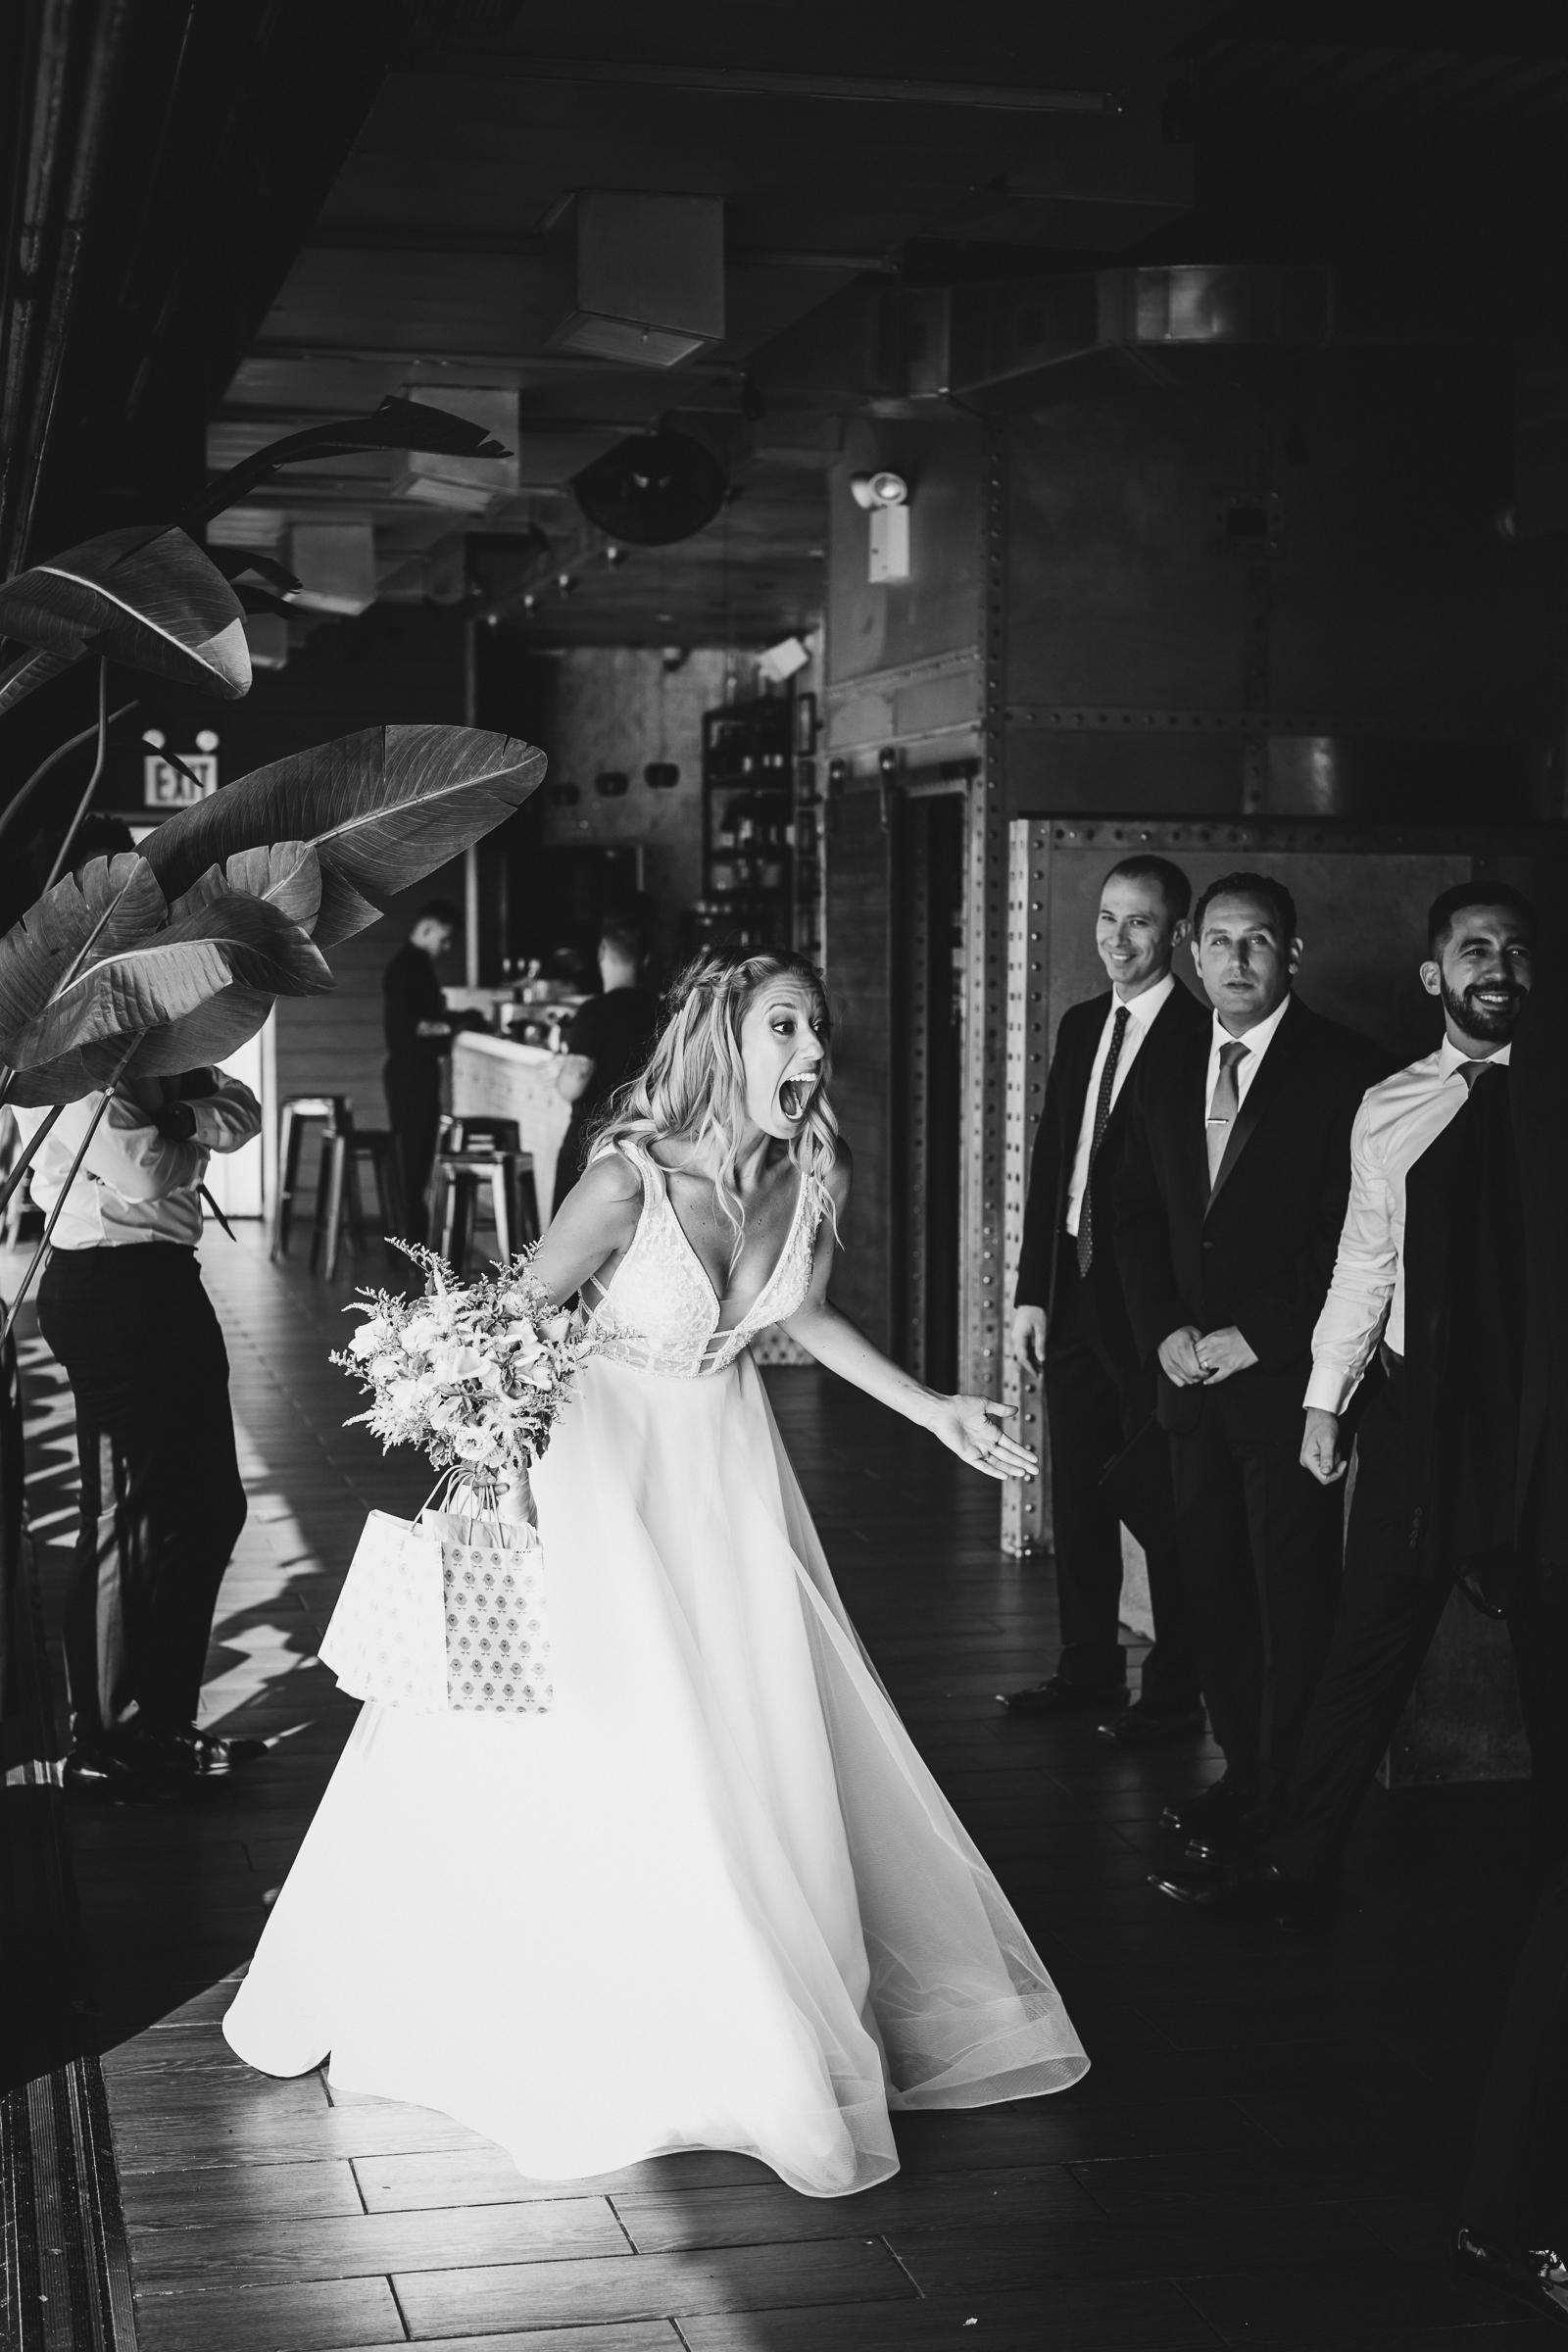 Ravel-Hotel-Penthouse-808-Long-Island-City-New-York-Documentary-Wedding-Photographer-45.jpg